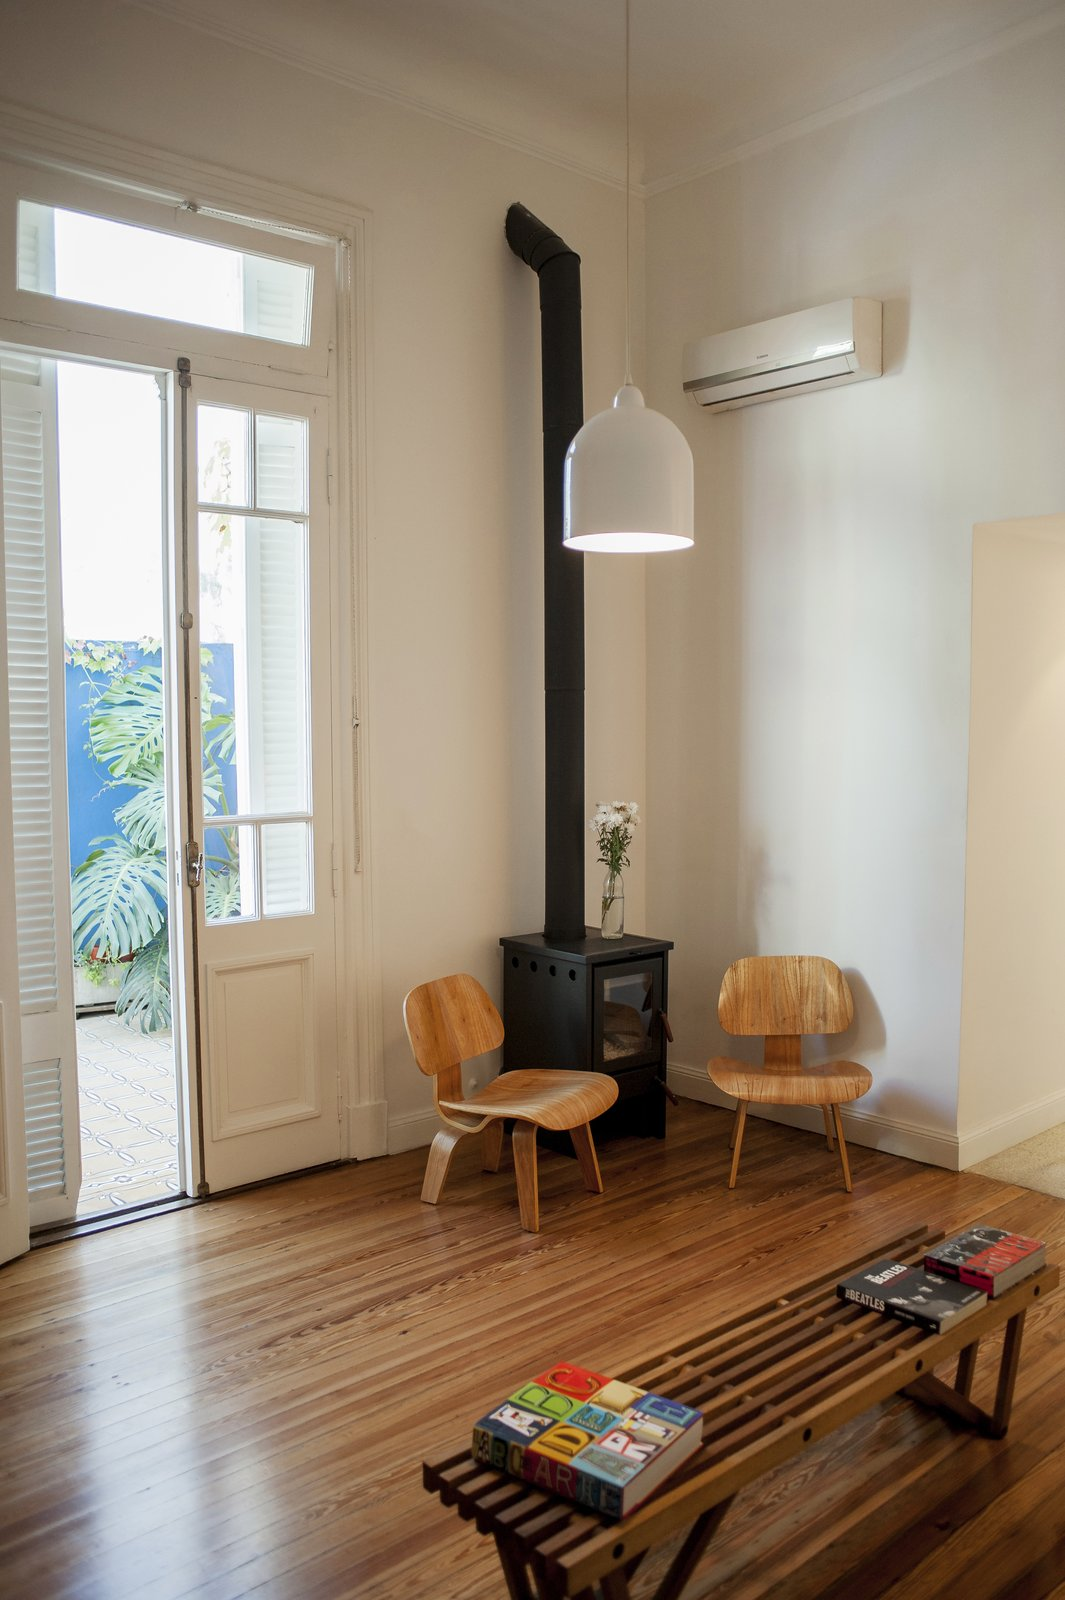 The living room preserves the original wooden floors and entrances  Artigas by melisa